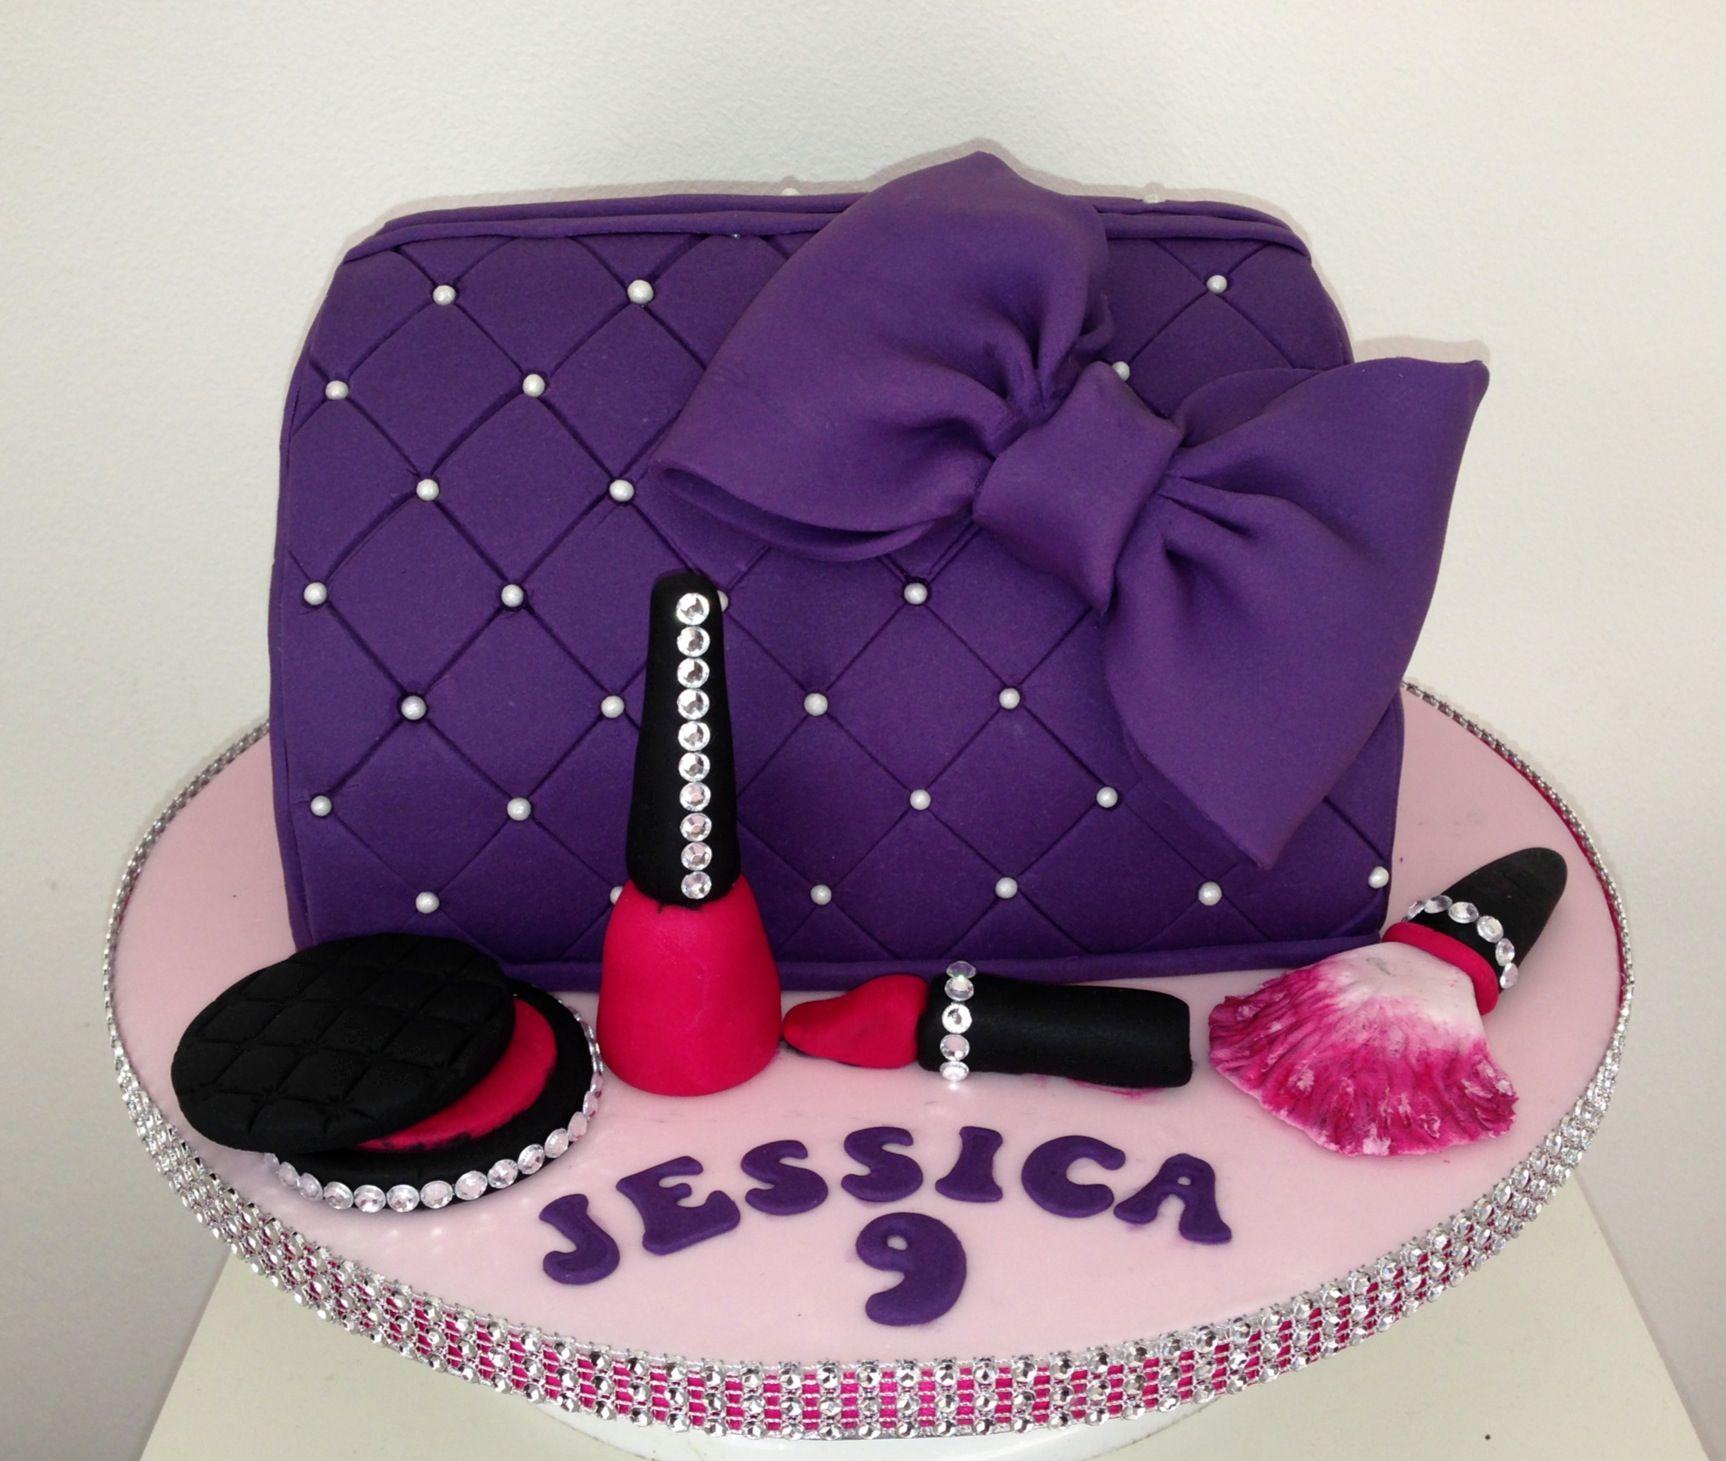 Make up bag cake | Cakes & Cupcakes | Pinterest